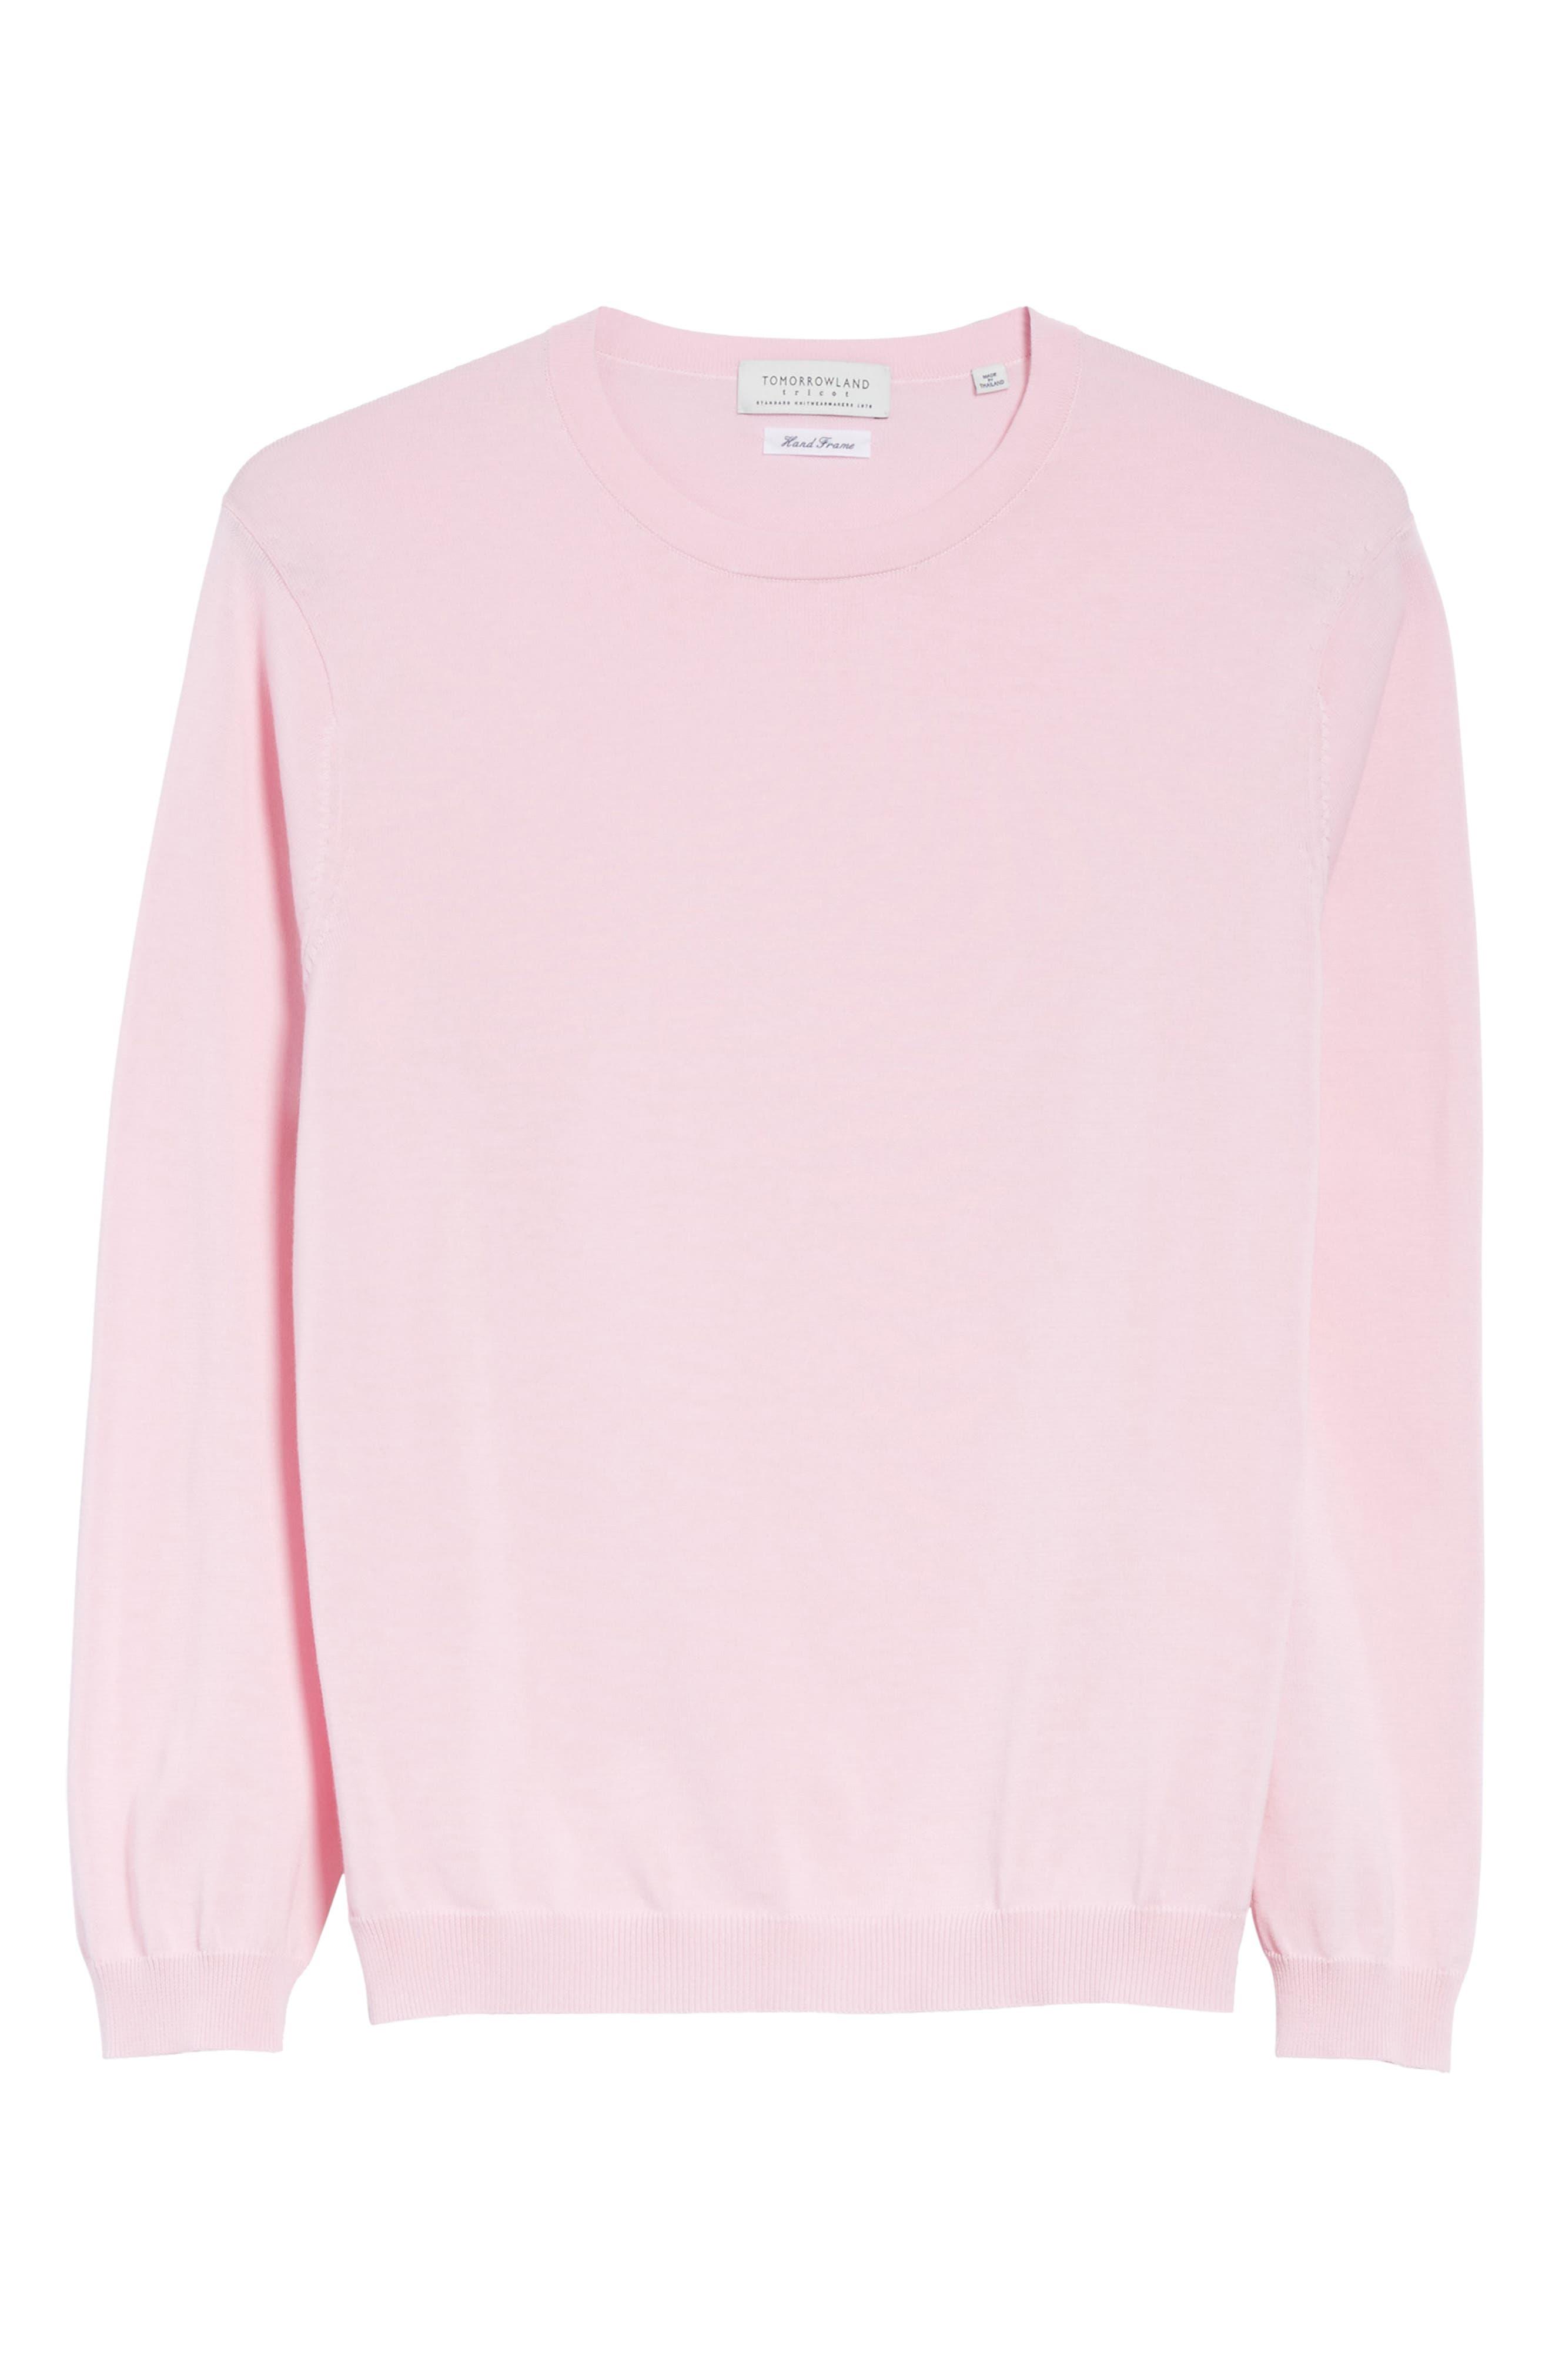 Crewneck Sweater,                             Alternate thumbnail 6, color,                             650